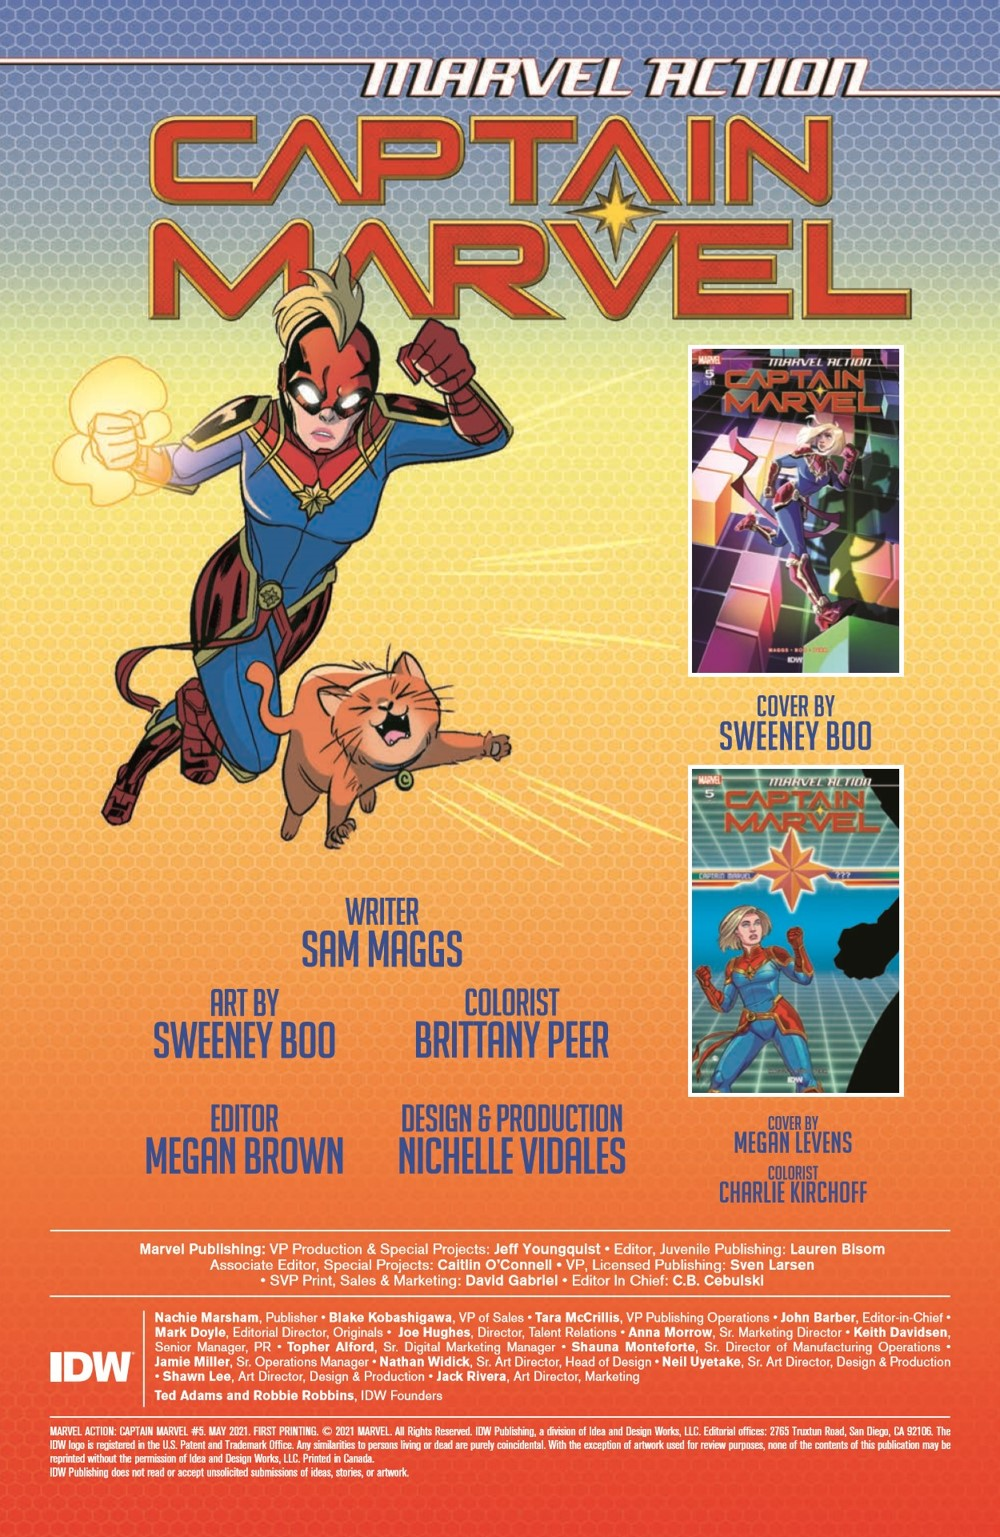 CaptainMarvel2_05_pr-2 ComicList Previews: MARVEL ACTION CAPTAIN MARVEL VOLUME 2 #5